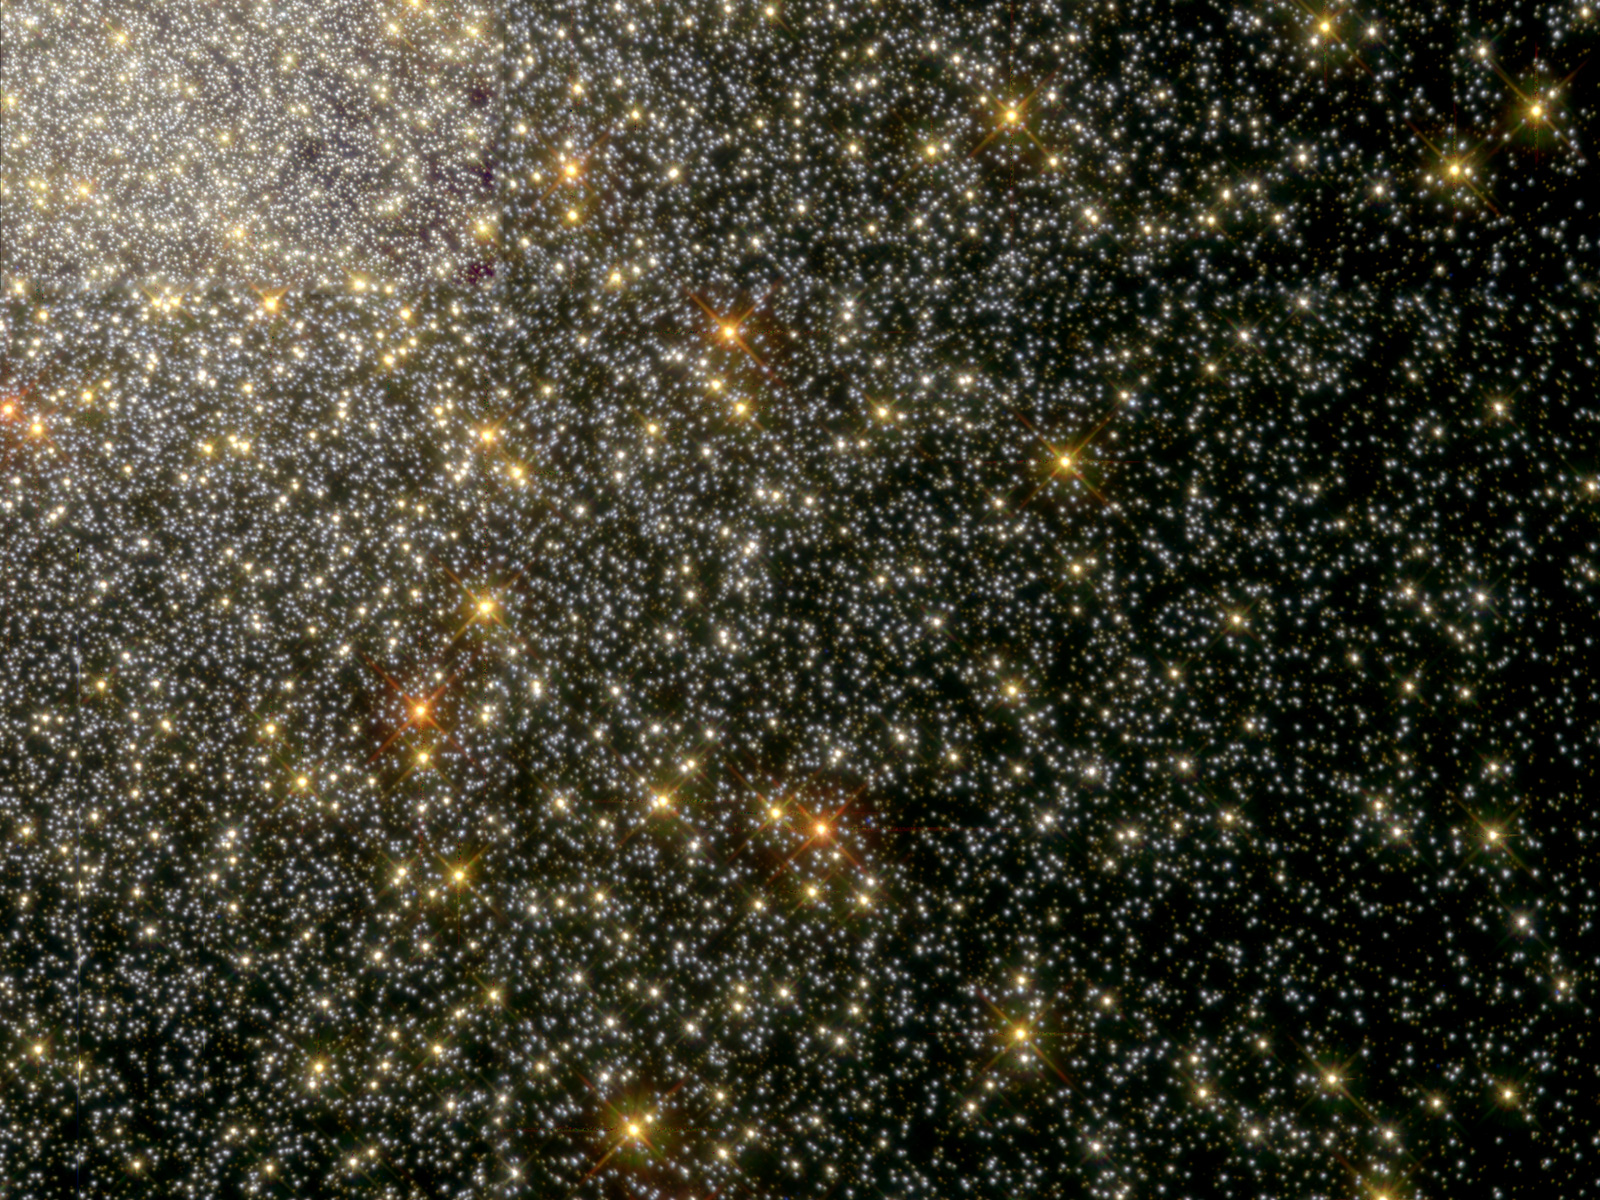 slick star wallpapers